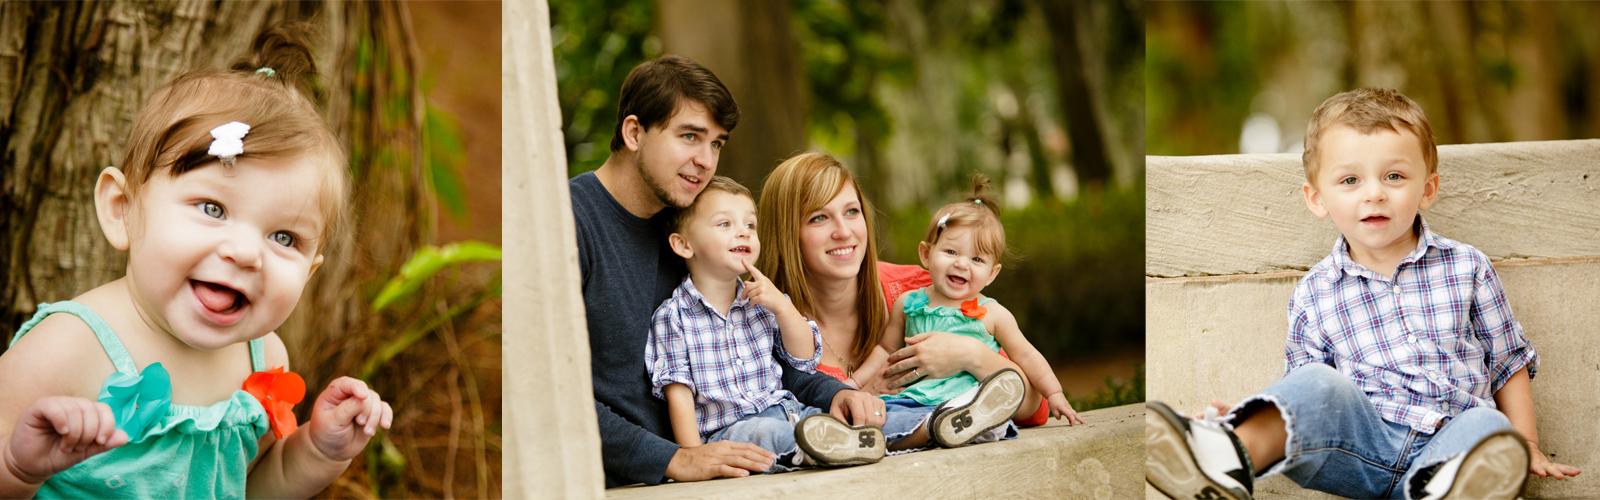 Slide 4 | Winter Park Family Portrait Sessions | Orlando Family Photographers